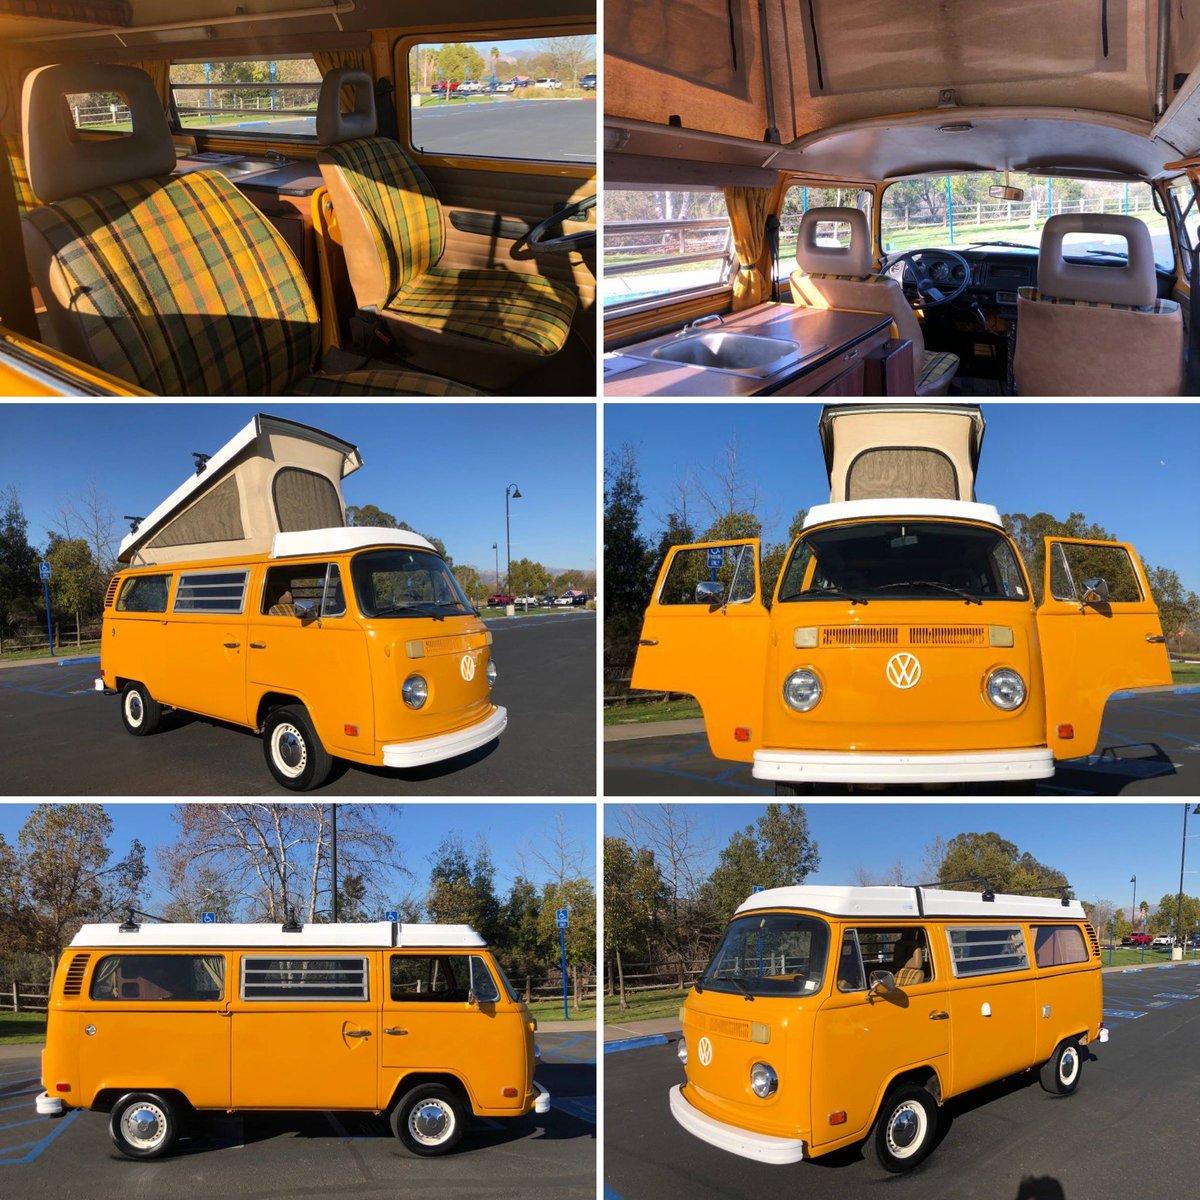 Vw Bus And Camper On Twitter 1977 Vw Westfalia Camper For Sale In Phoenix 19 500 No Rust Ac Original Interior Top Appears Perfect Craigslist Phoenix Vwbus Vw Vwcamper Westfalia Https T Co 57hn19umqd